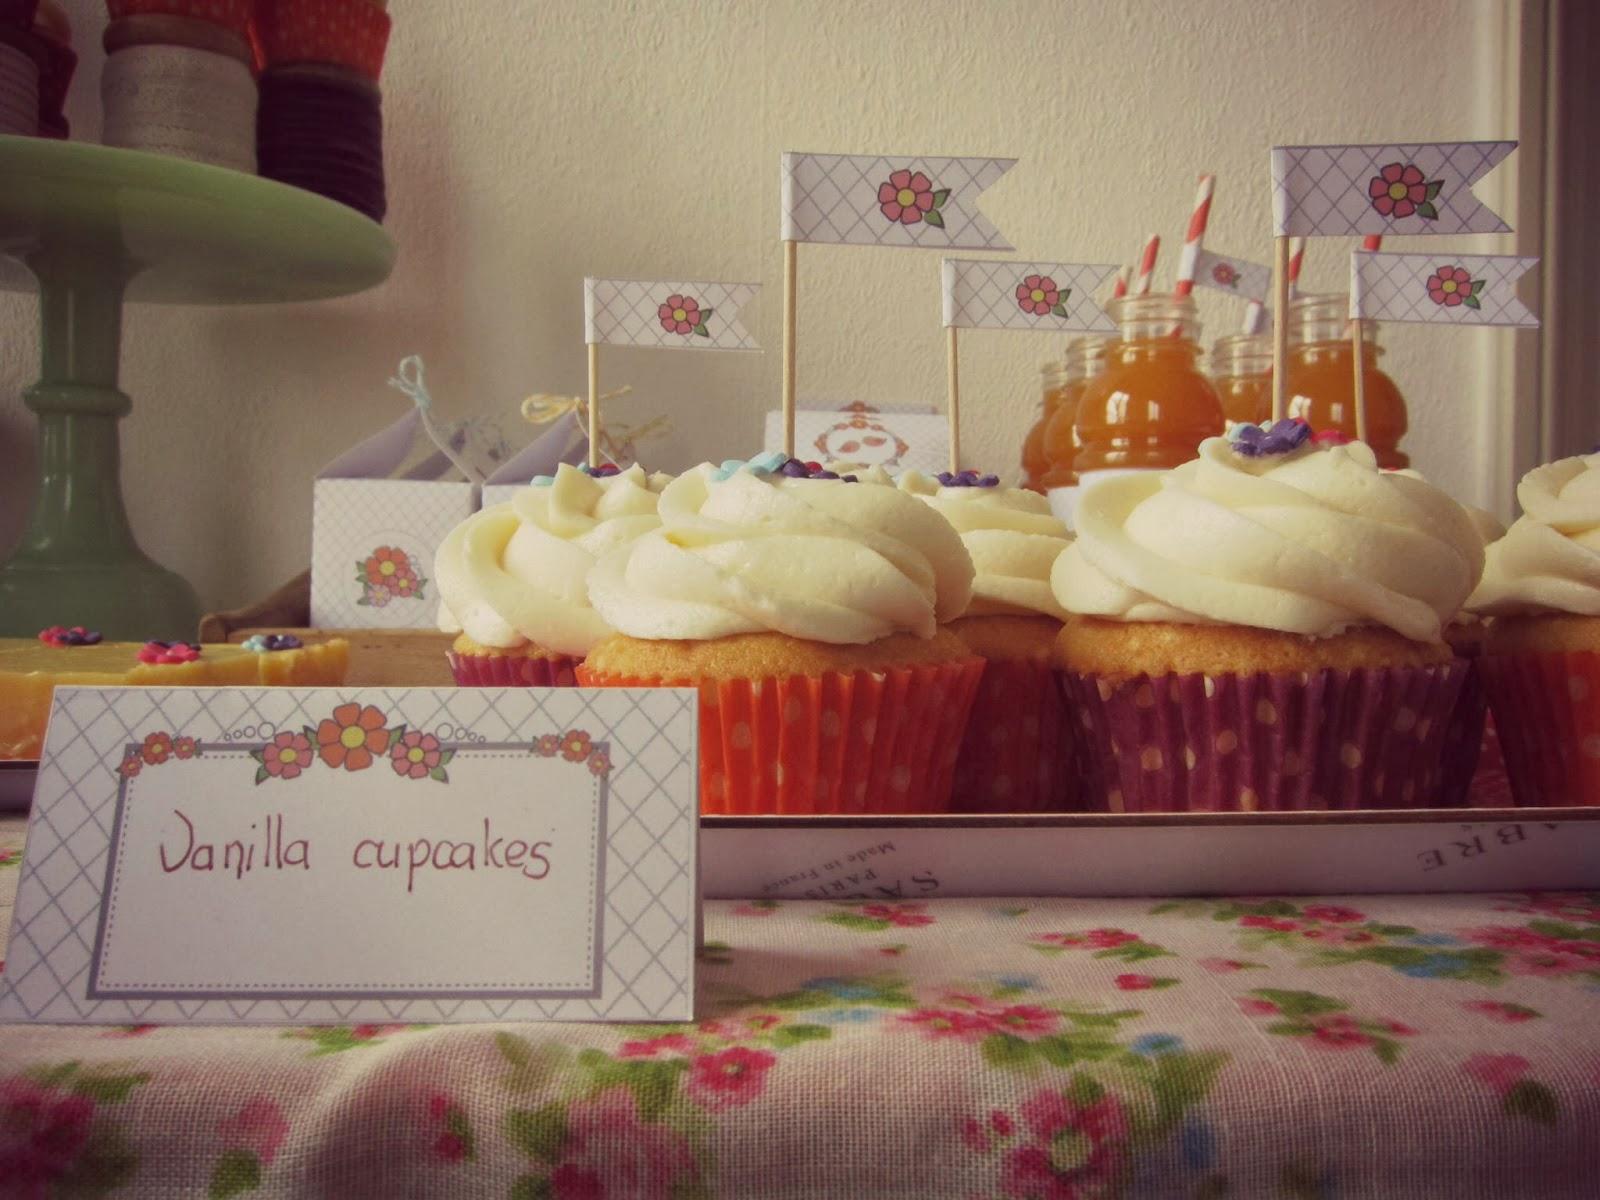 cupcake a la vanille, decoration fleurie